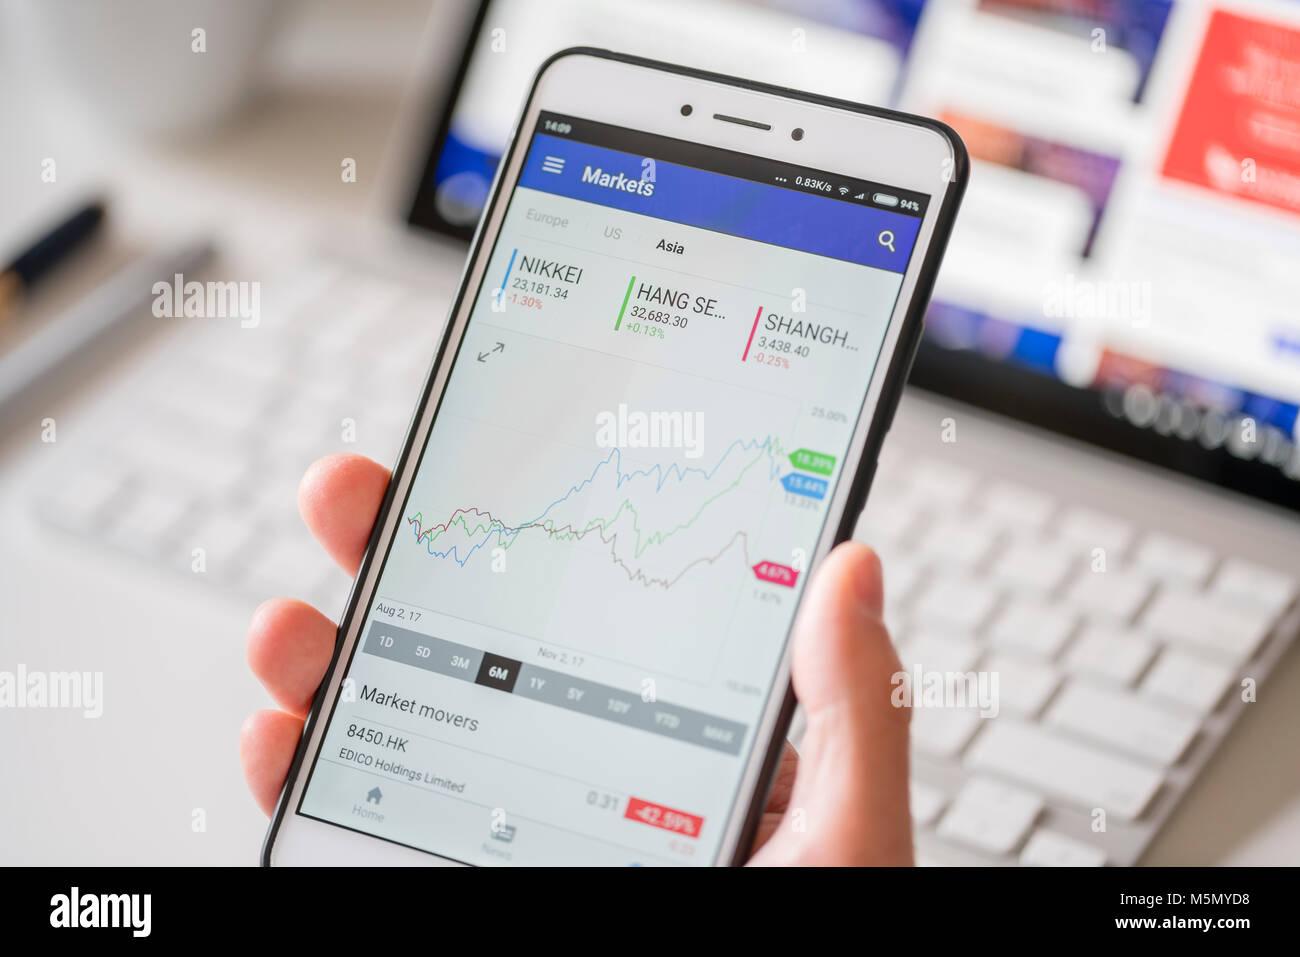 Melbourne, Australia - Feb 2, 2018: Checking data of the Asia stock market on a smartphone - Stock Image